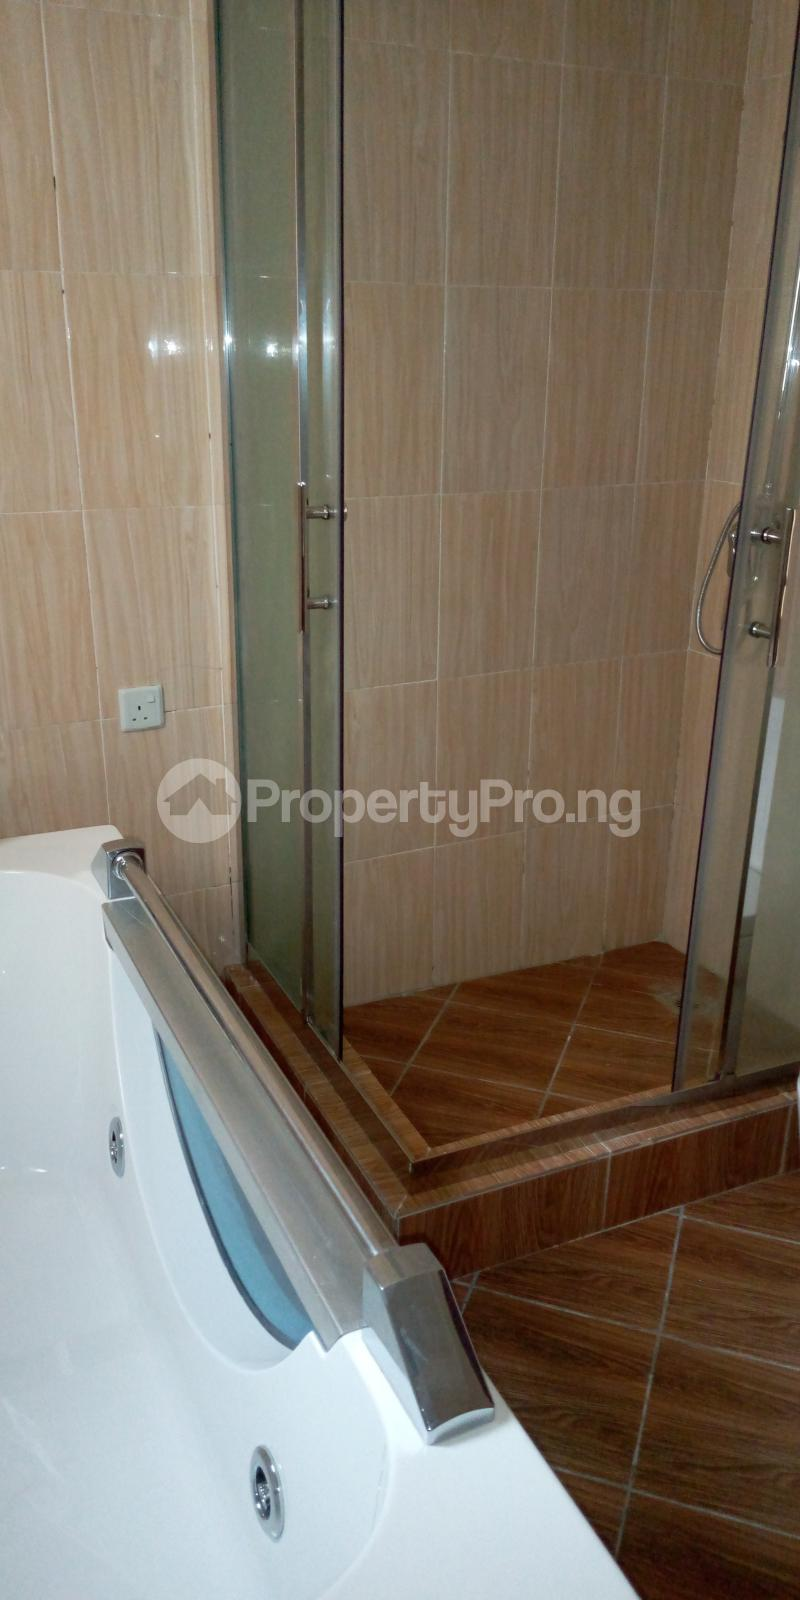 5 bedroom Detached Duplex House for rent Peace Gardens Estate Monastery road Sangotedo Lagos - 8